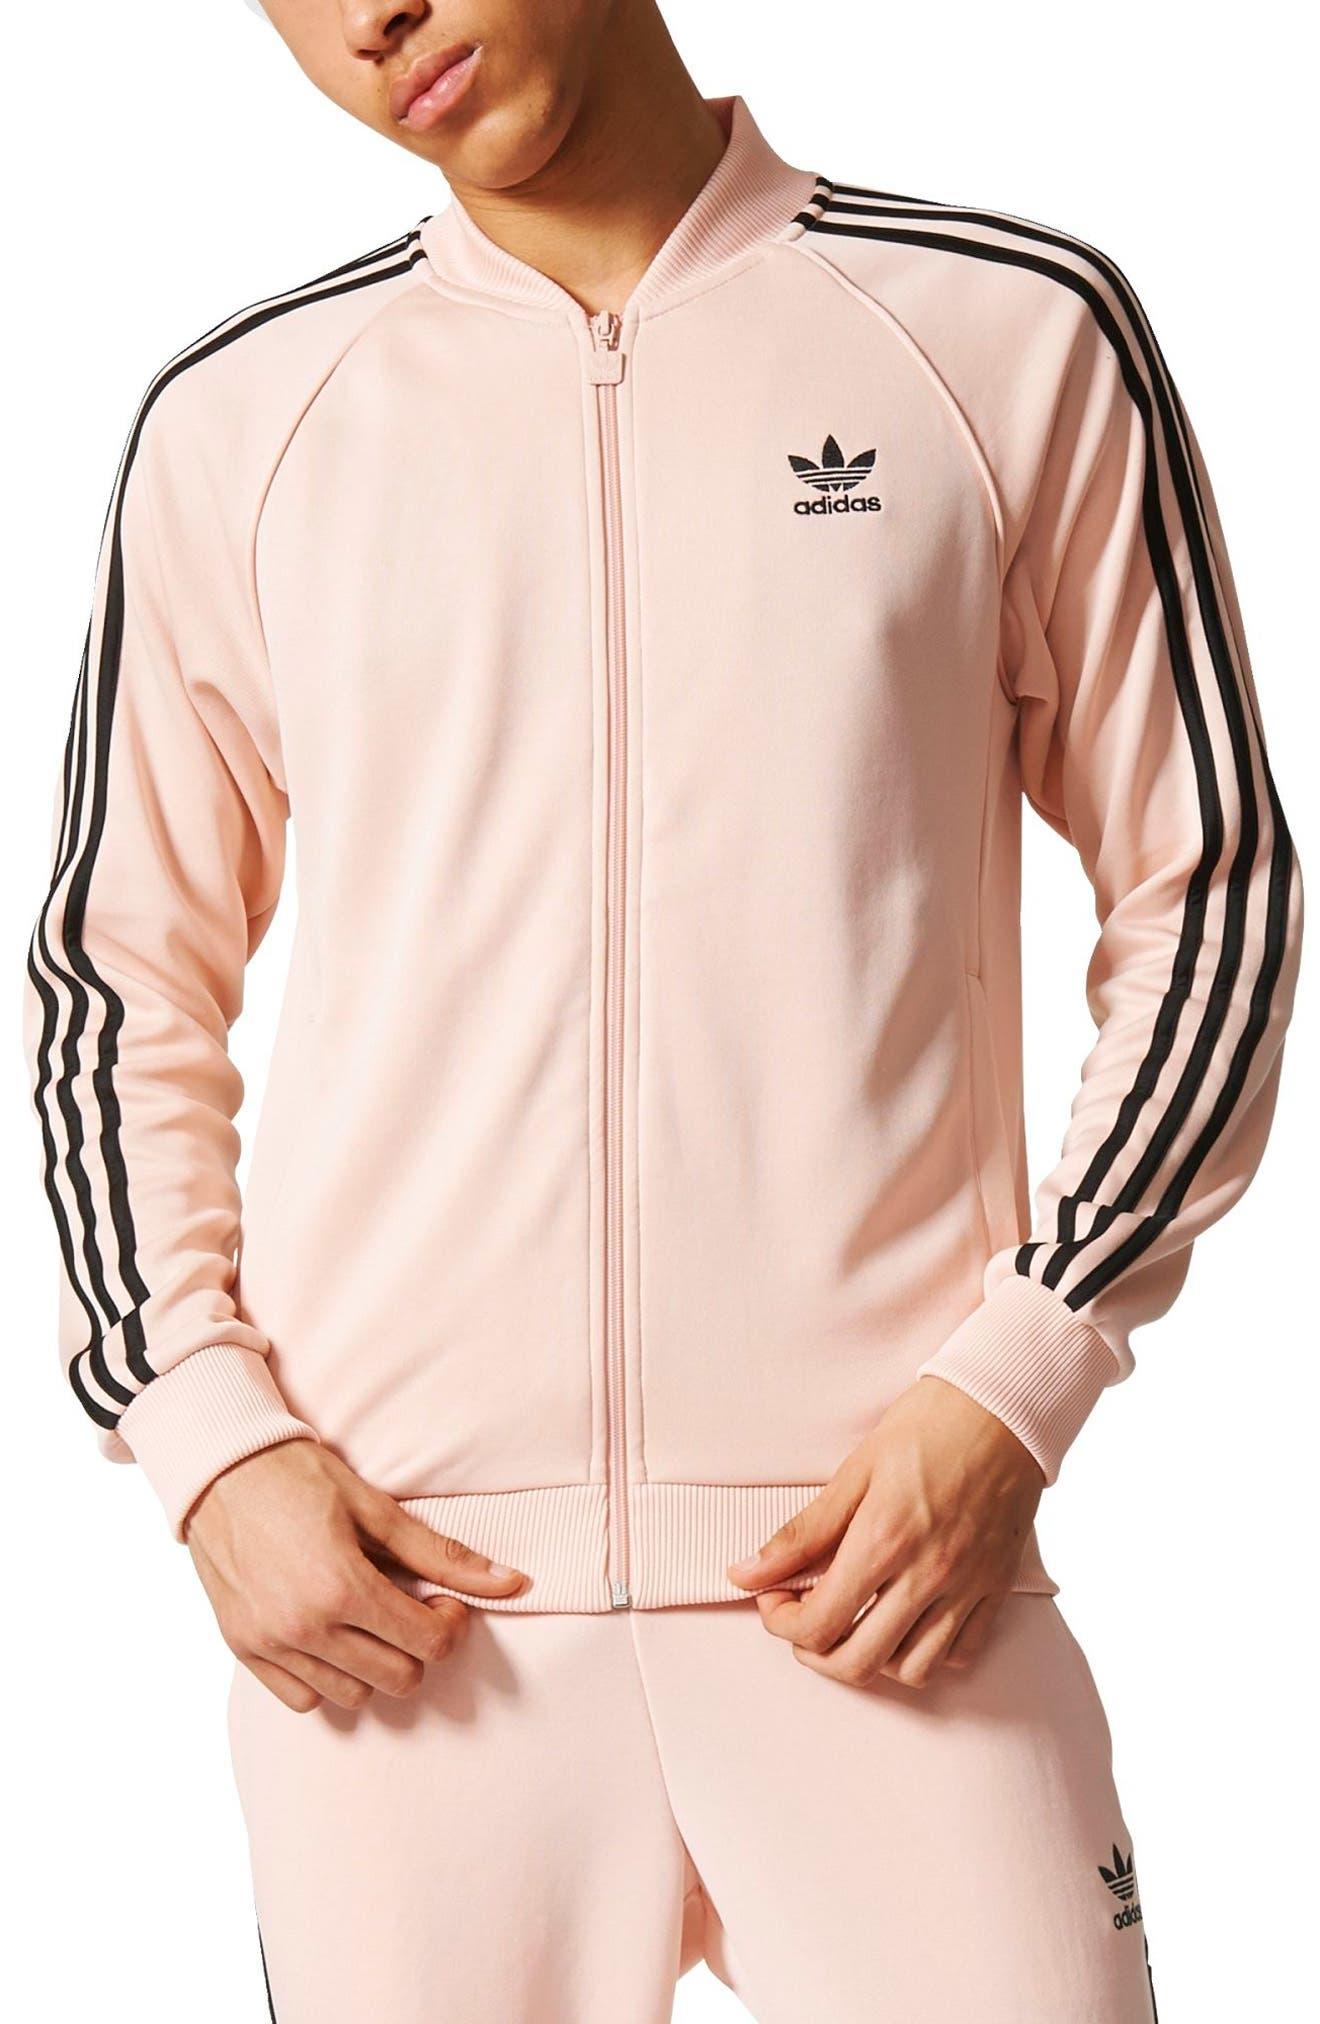 Main Image - adidas Originals 'Superstar' Track Jacket